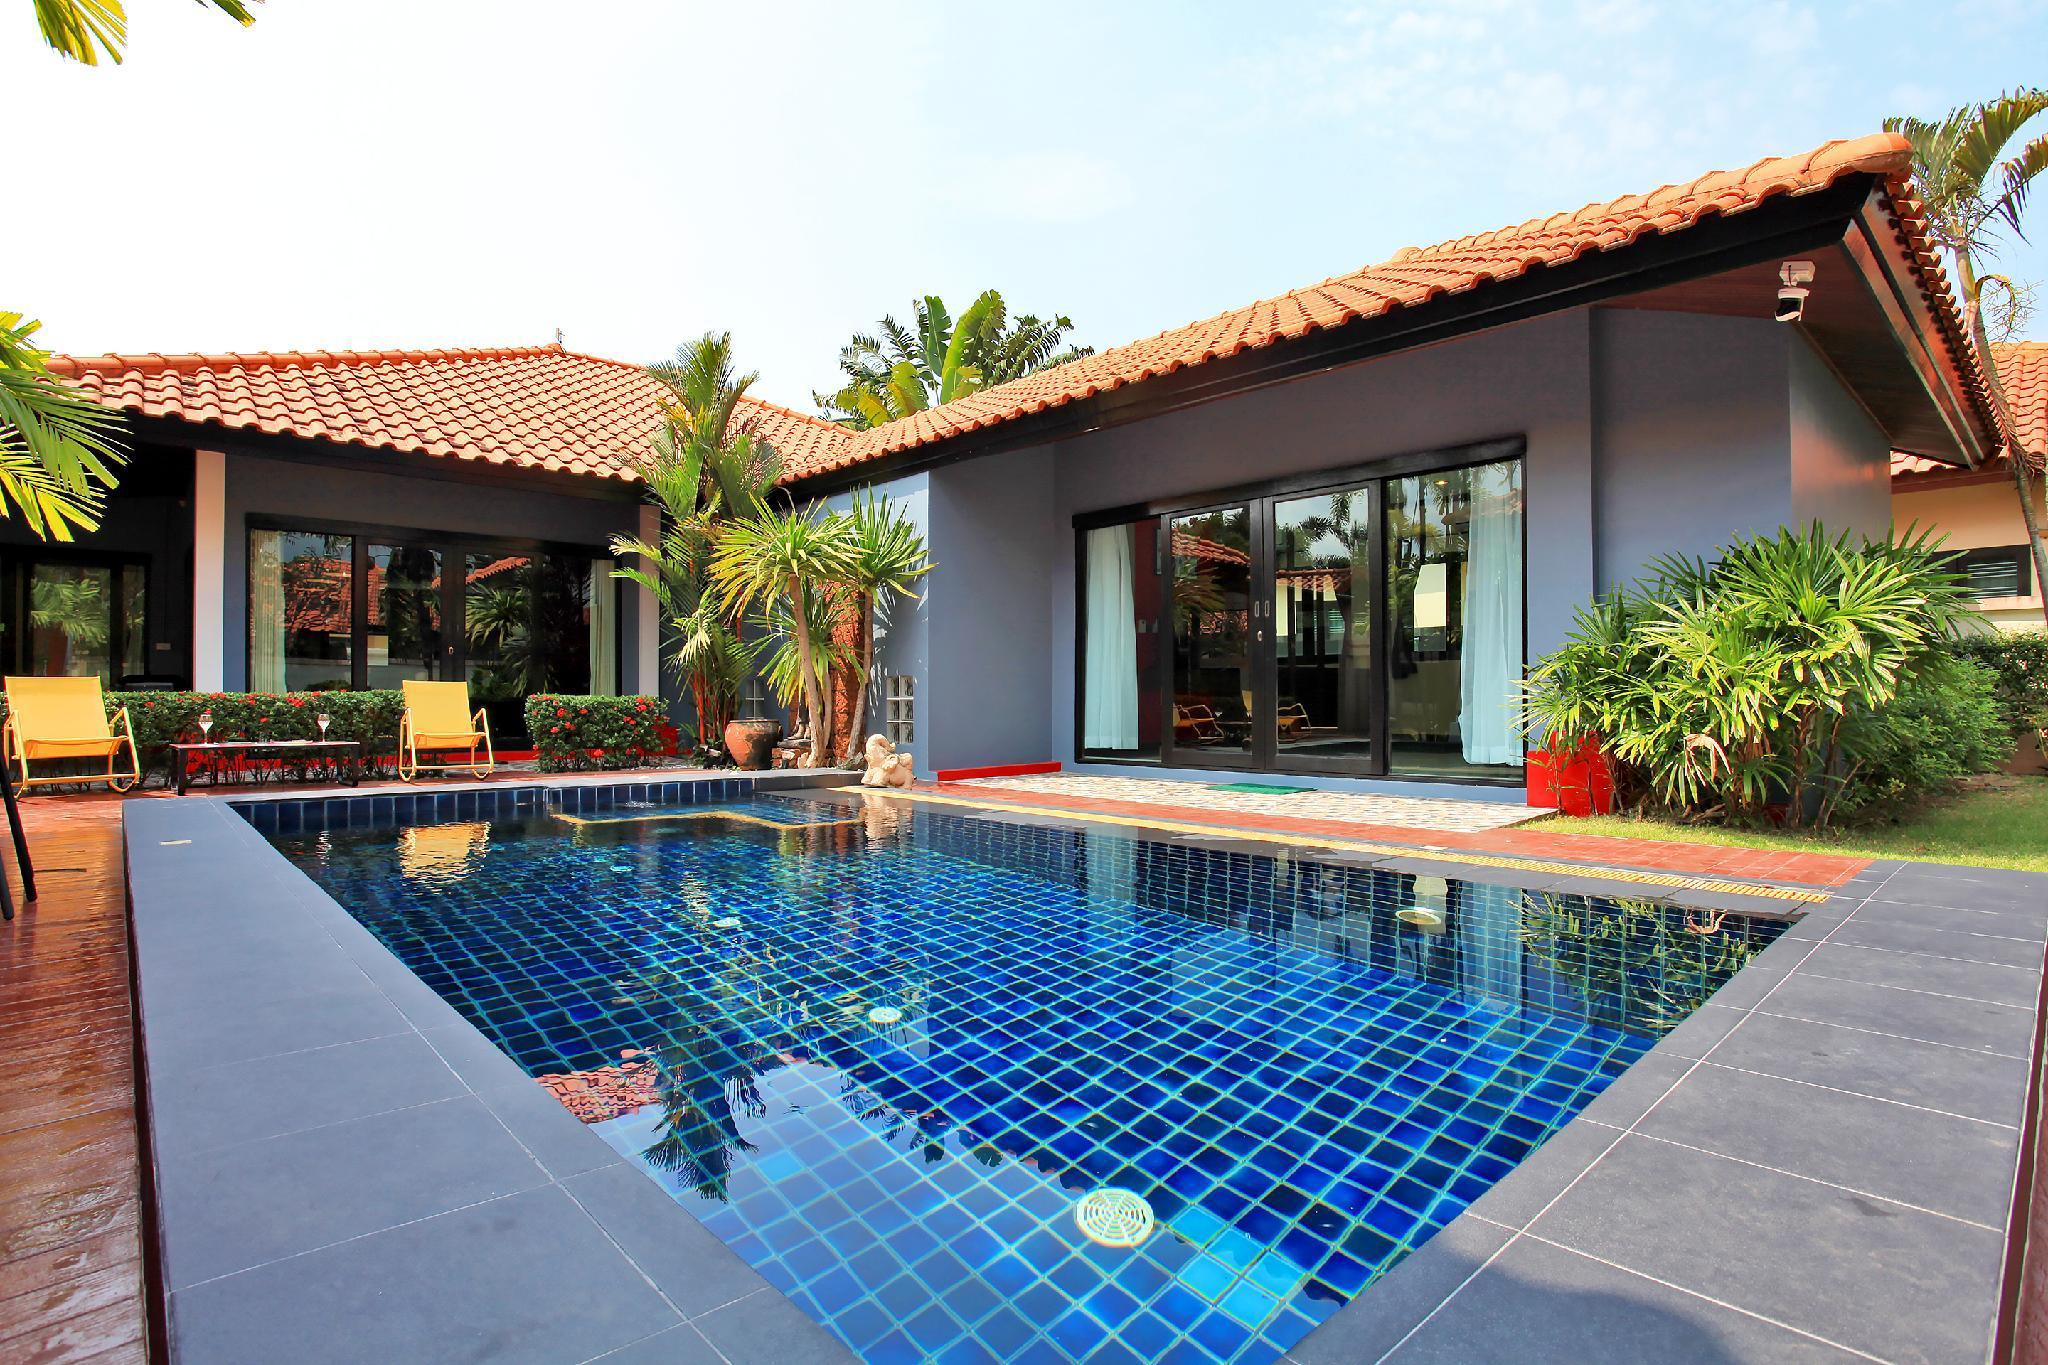 Fandango Villa, 3 Bed Home at Na Jomtien Pattaya Fandango Villa, 3 Bed Home at Na Jomtien Pattaya